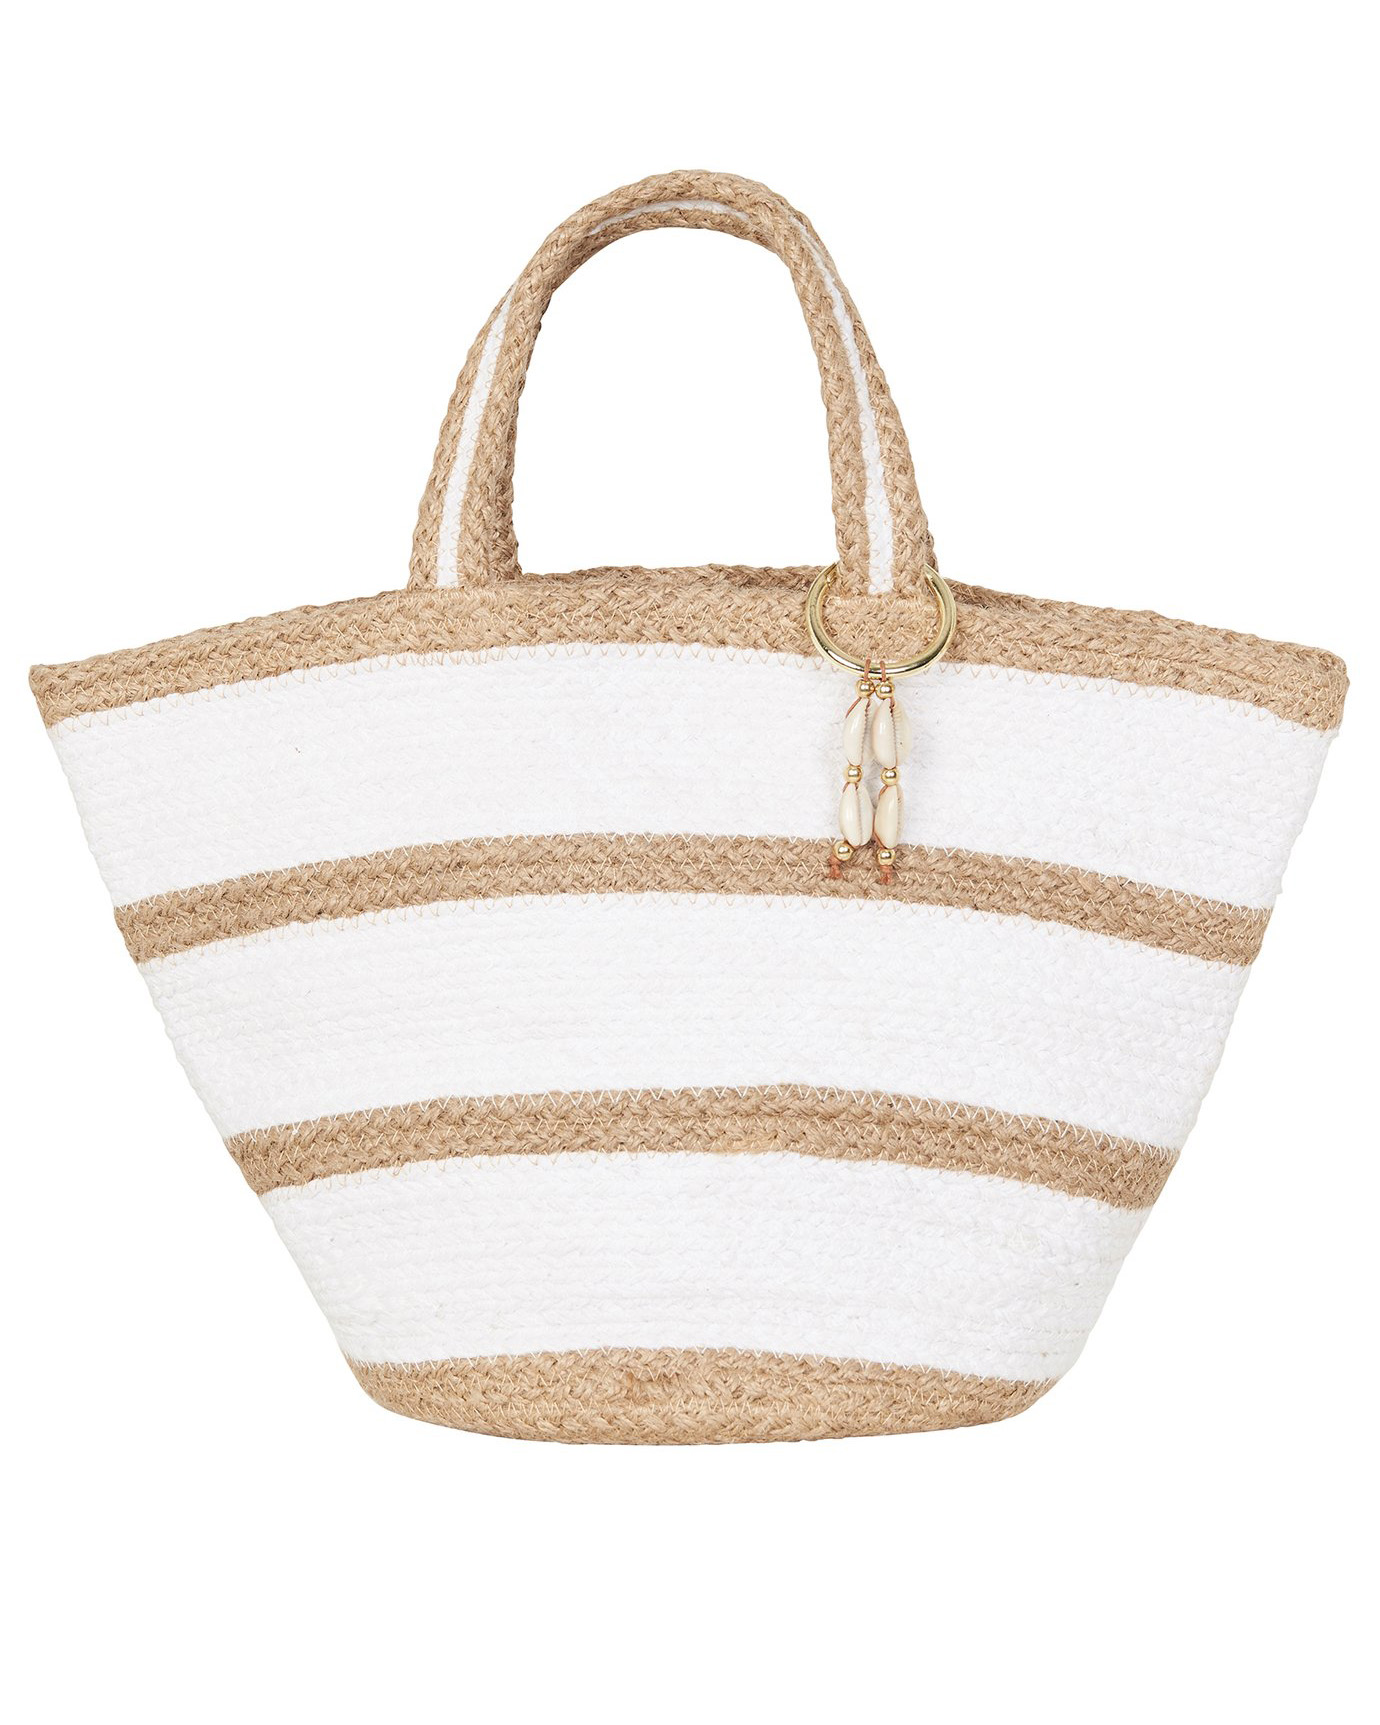 Сумка Seafolly Stripe Jute Basket (Natural) OS фото